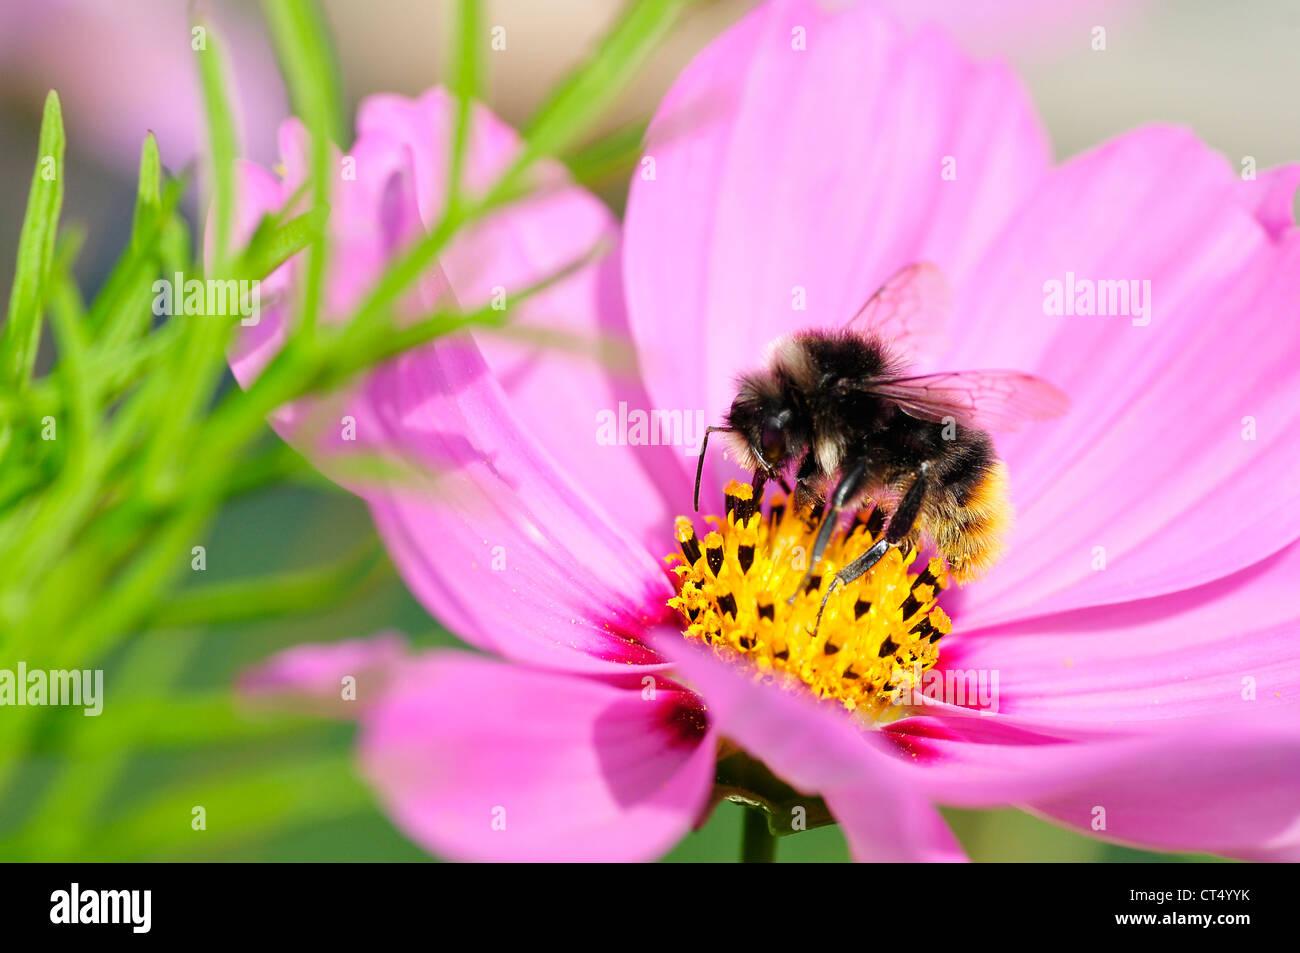 Macro of honey bee (Apis) feeding on pink cosmos flower - Stock Image